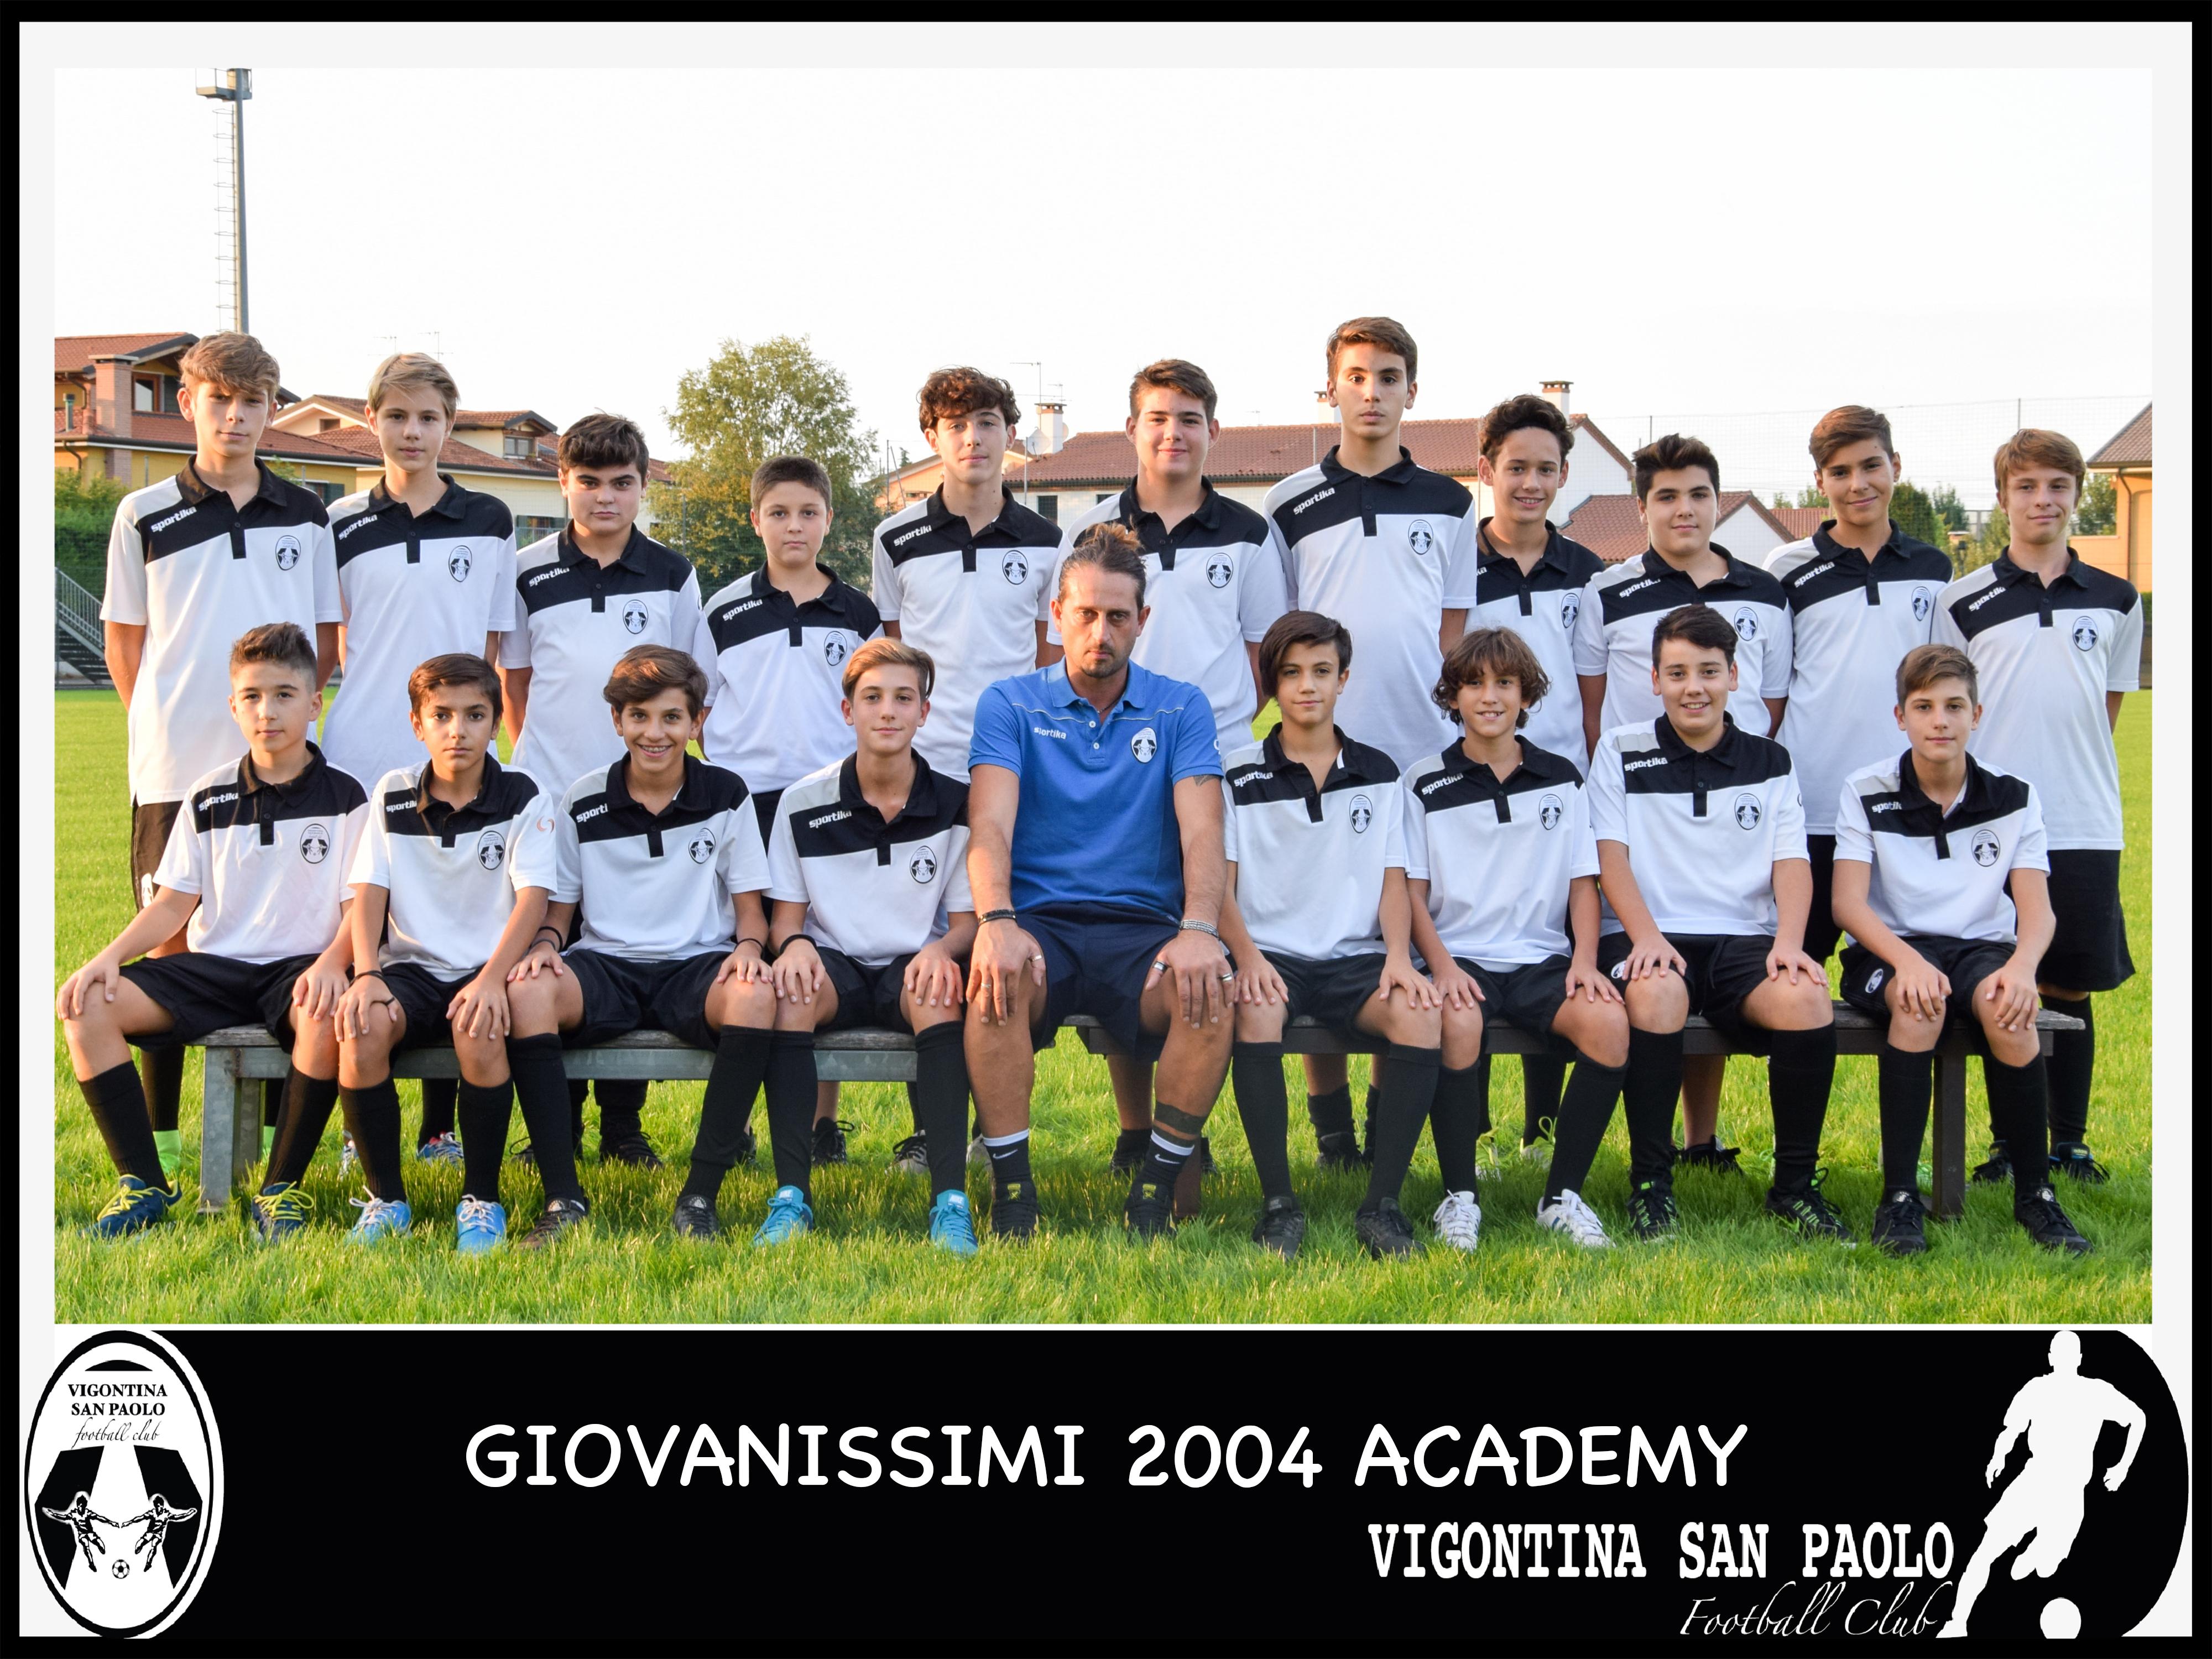 Calendario Giovanissimi Provinciali.Giovanissimi Provinciali Academy 2004 Tombolo Vigontina